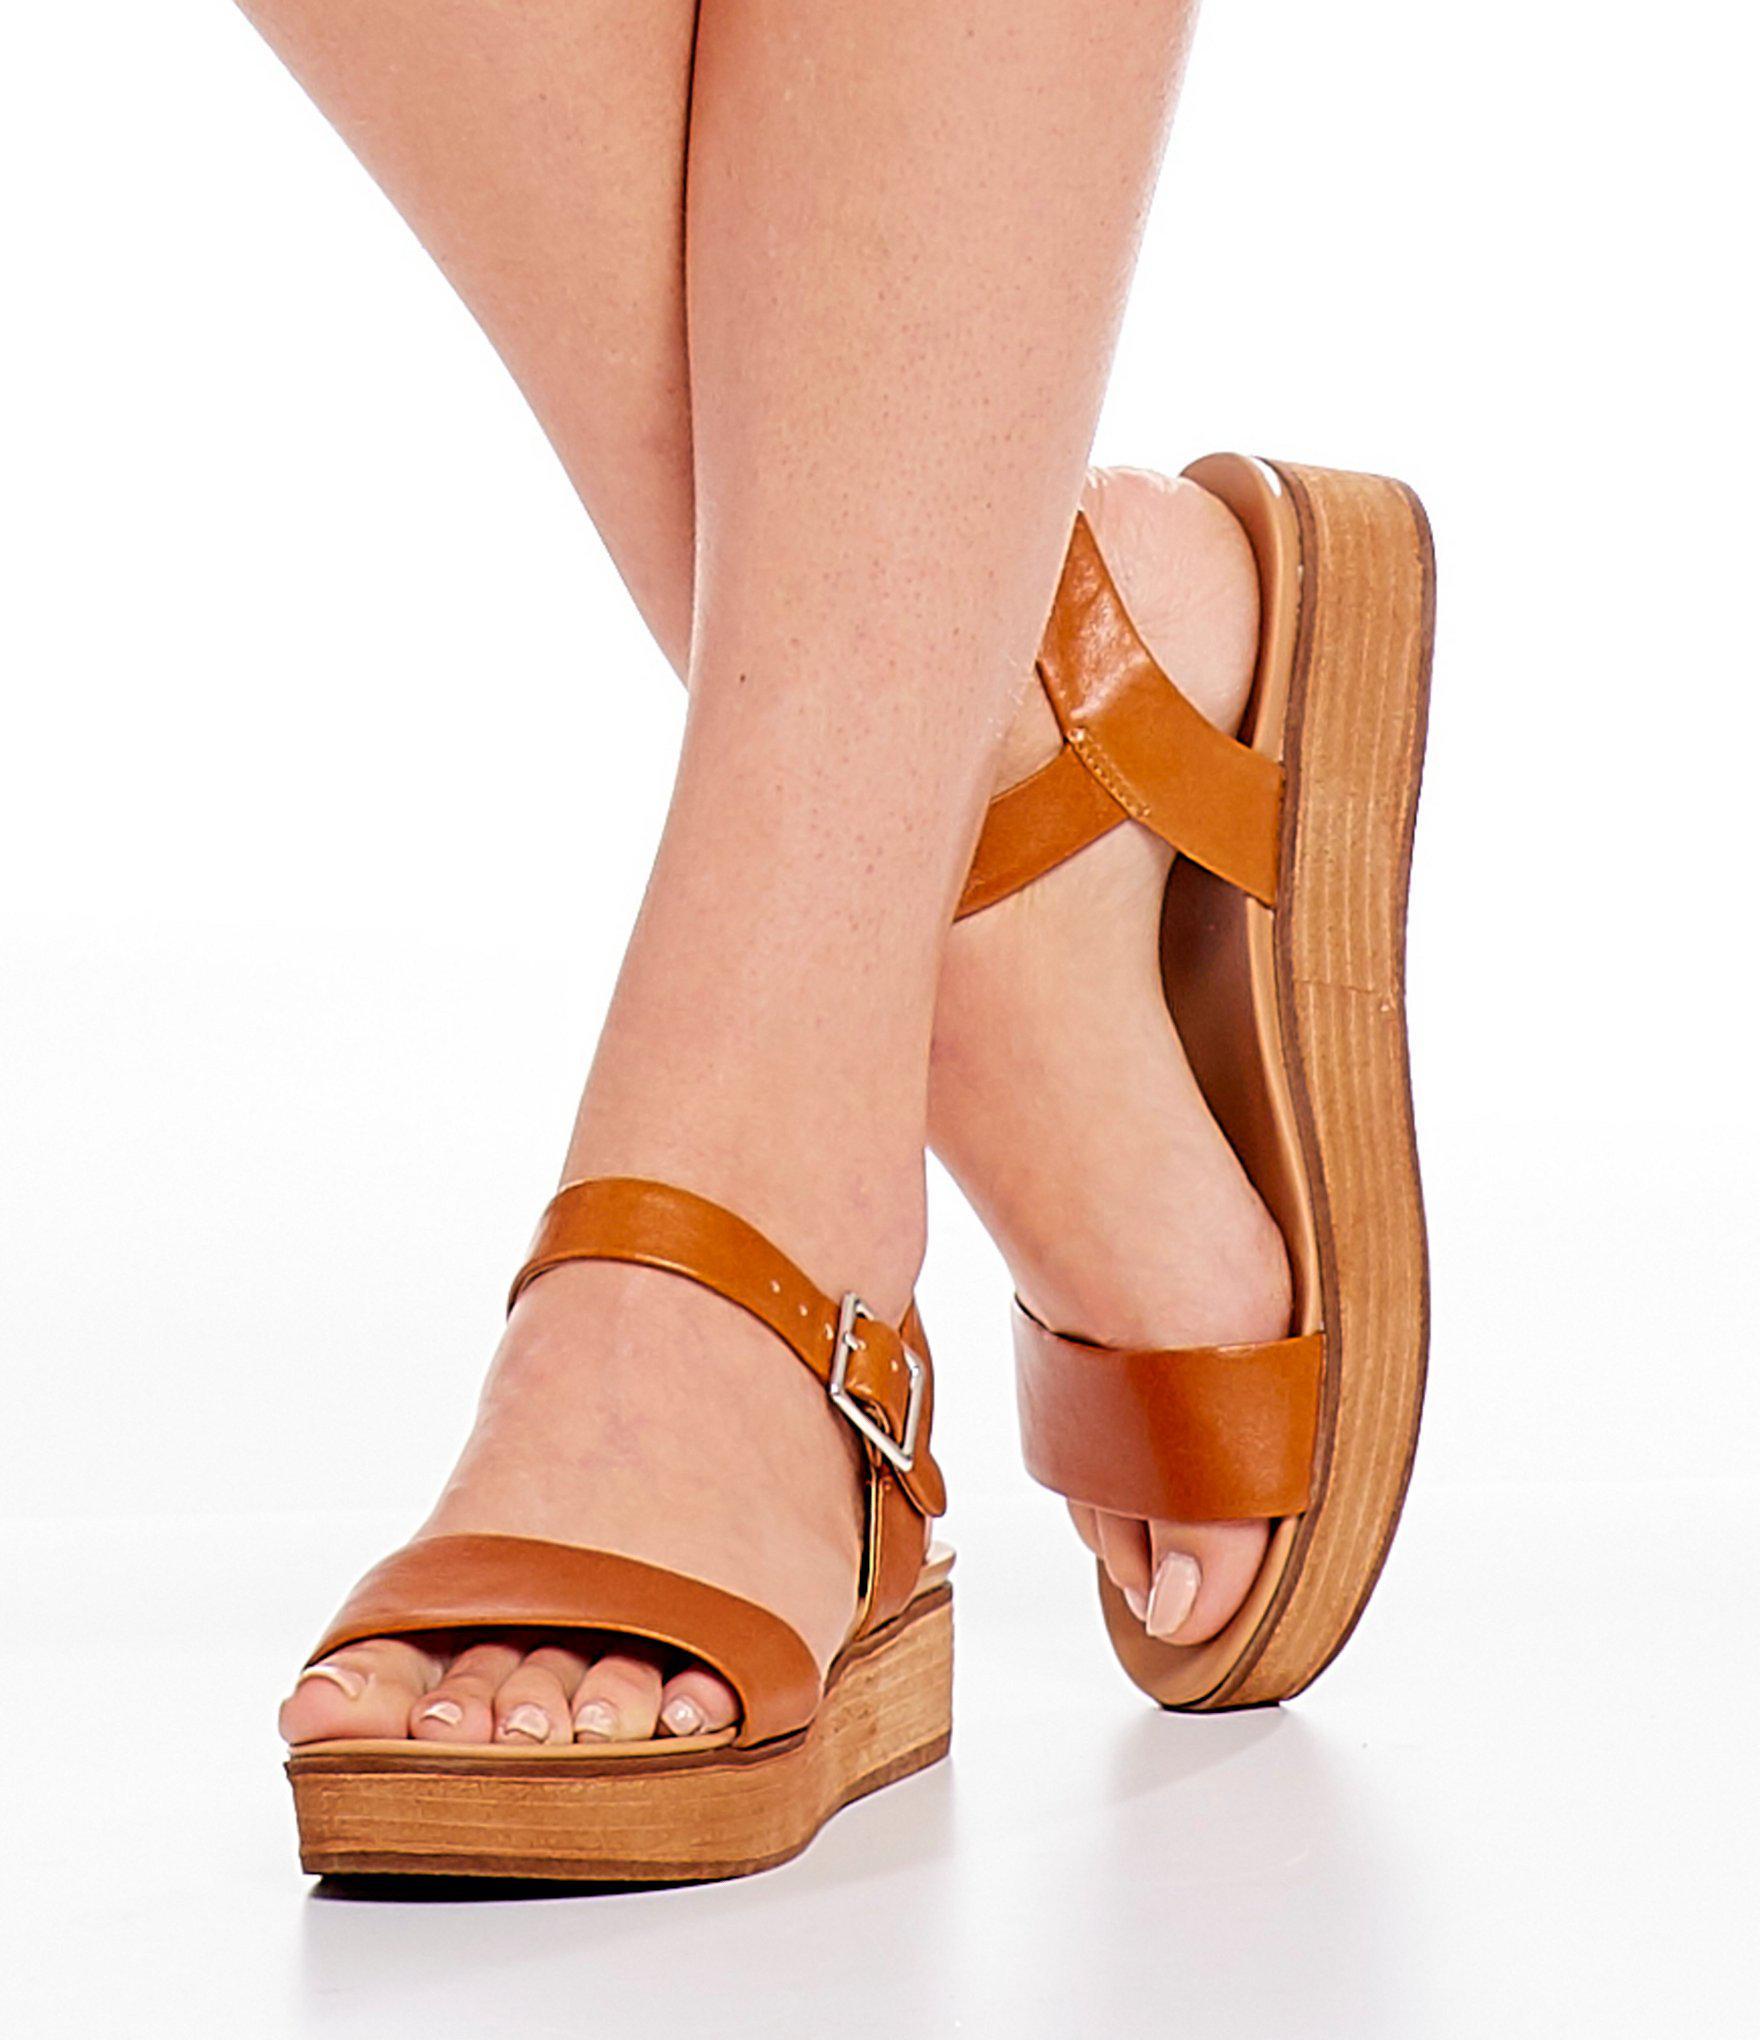 967b6515cf Steve Madden Aida Platform Sandals in Brown - Lyst